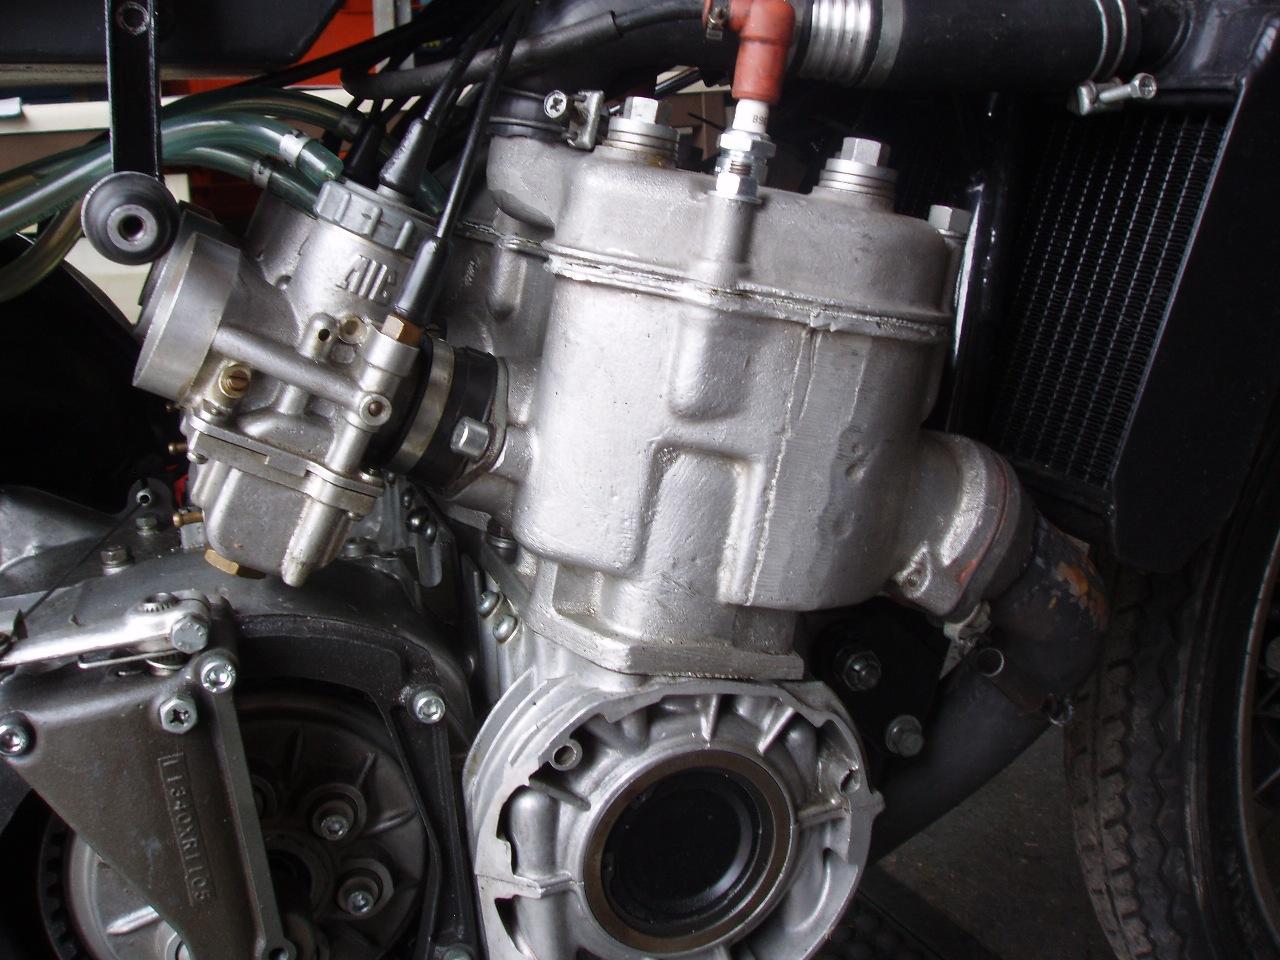 Bdk Race Engineering Tr750s 1980 Corvette Engine Diagram Daytona Cylinders